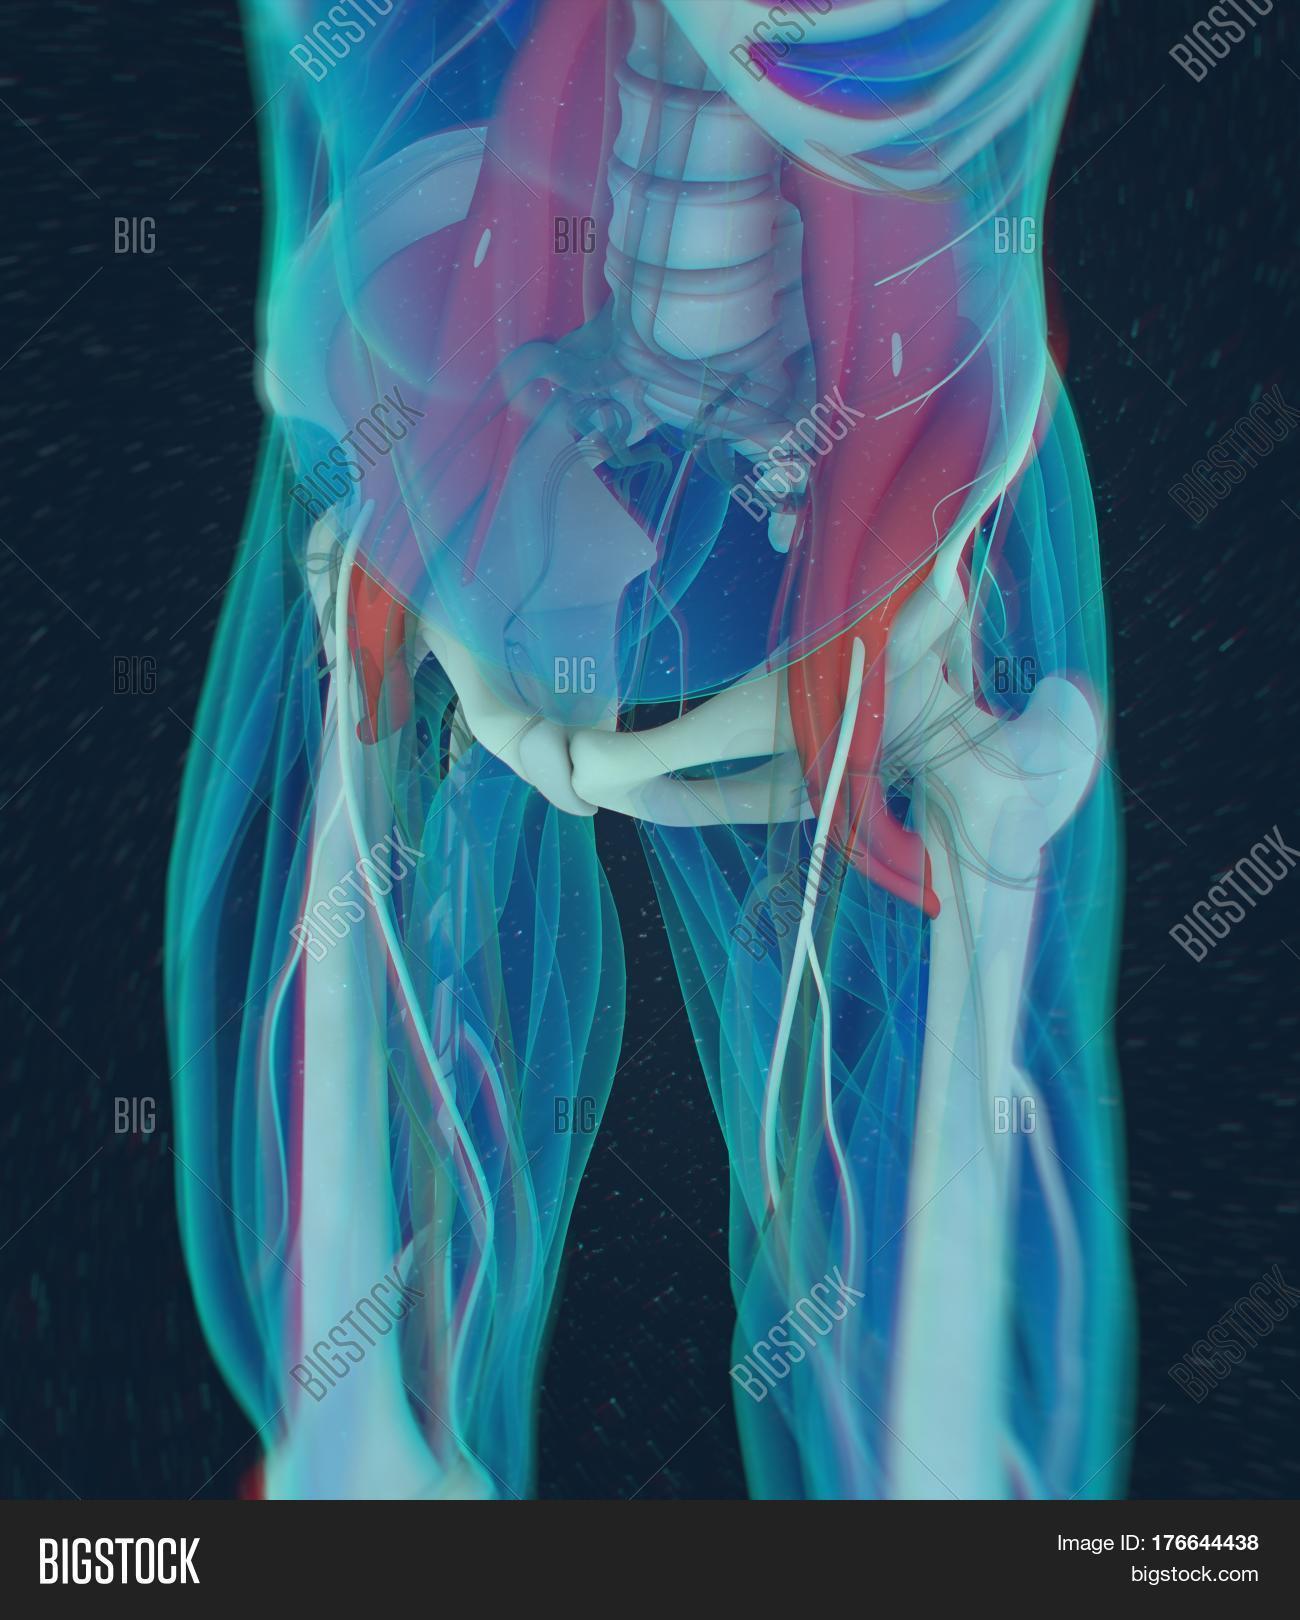 Human Anatomy, Psoas Image & Photo (Free Trial) | Bigstock